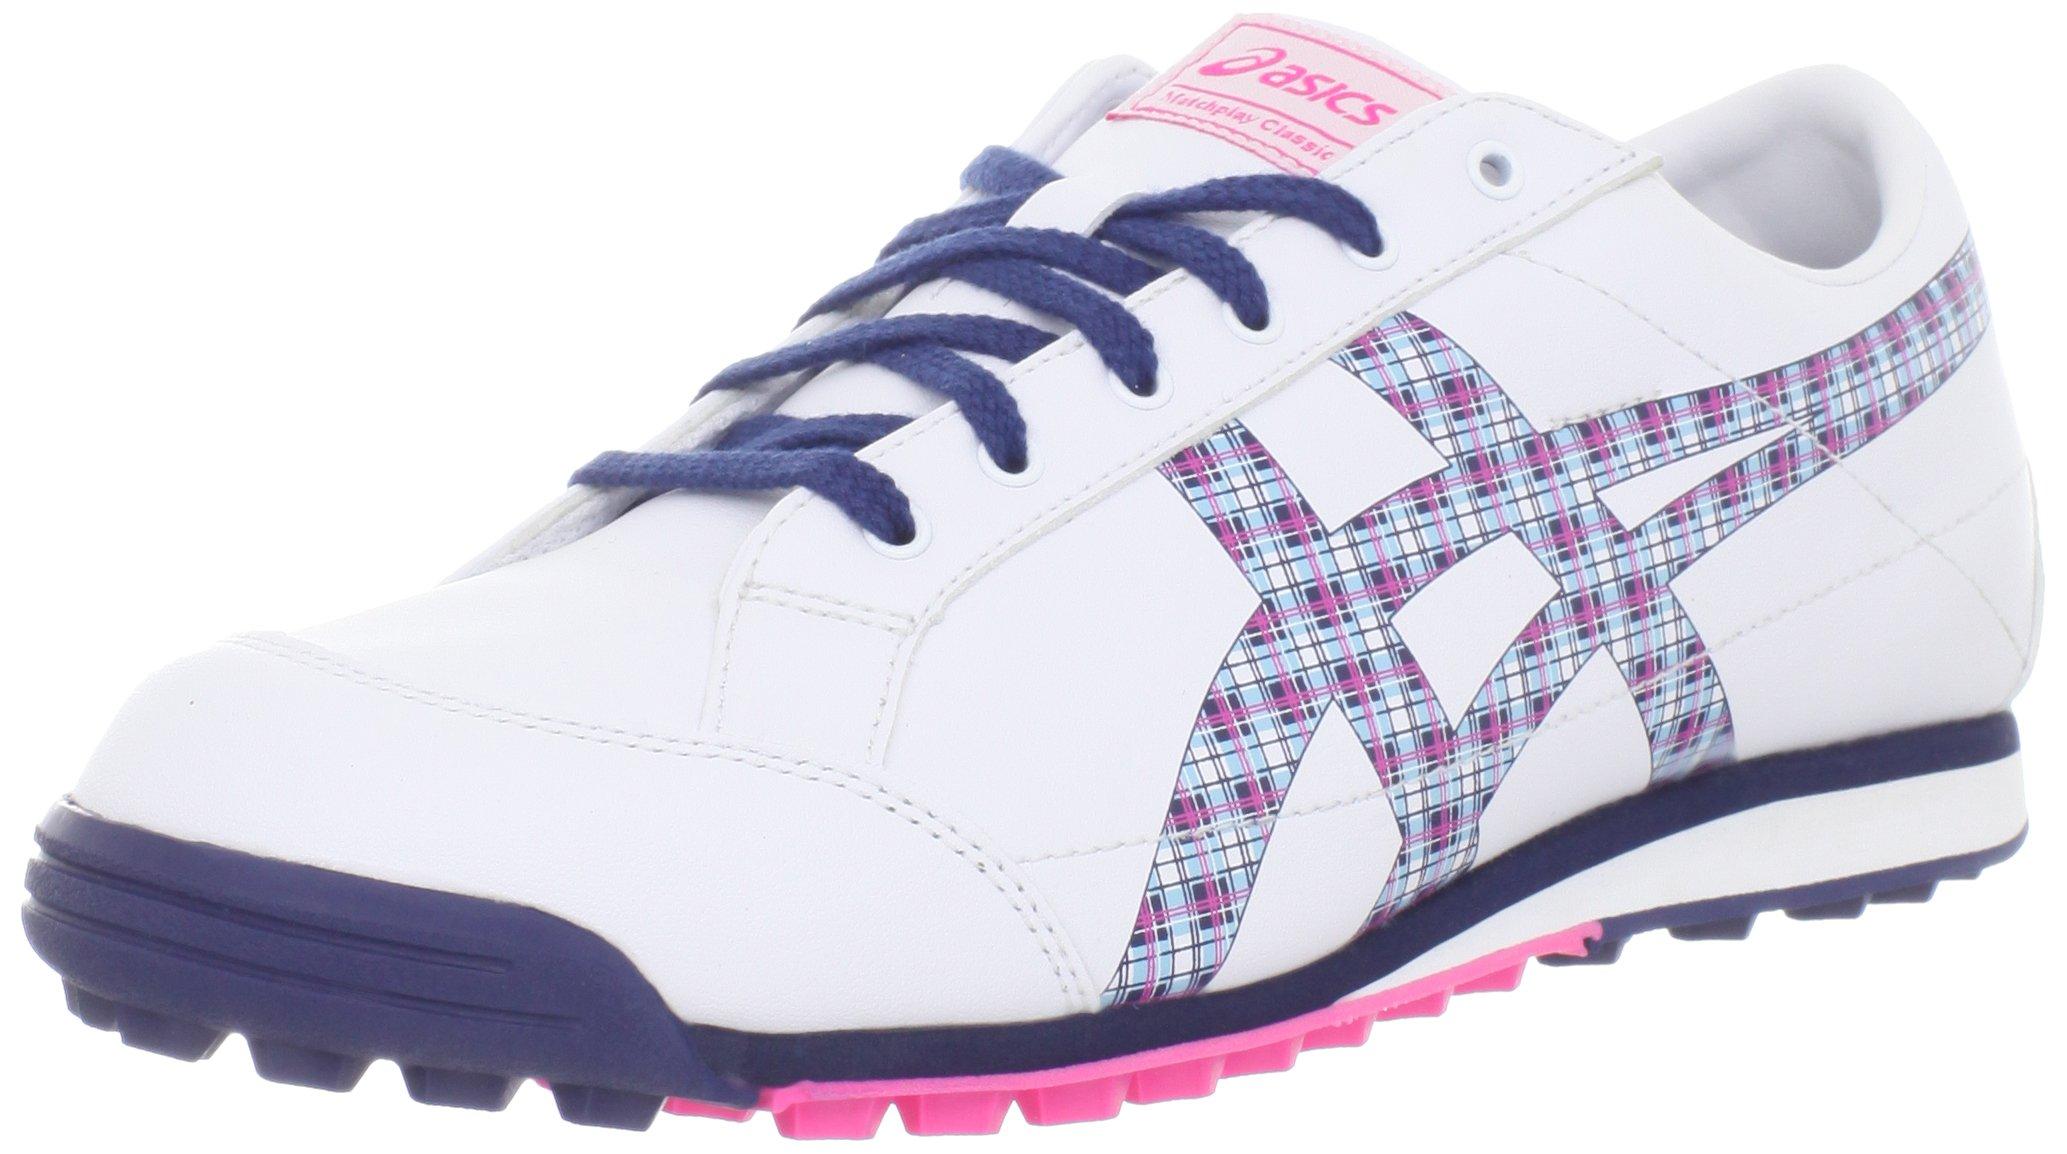 ASICS Women's Matchplay Classic White/Navy Sneaker 6 B - Medium by ASICS